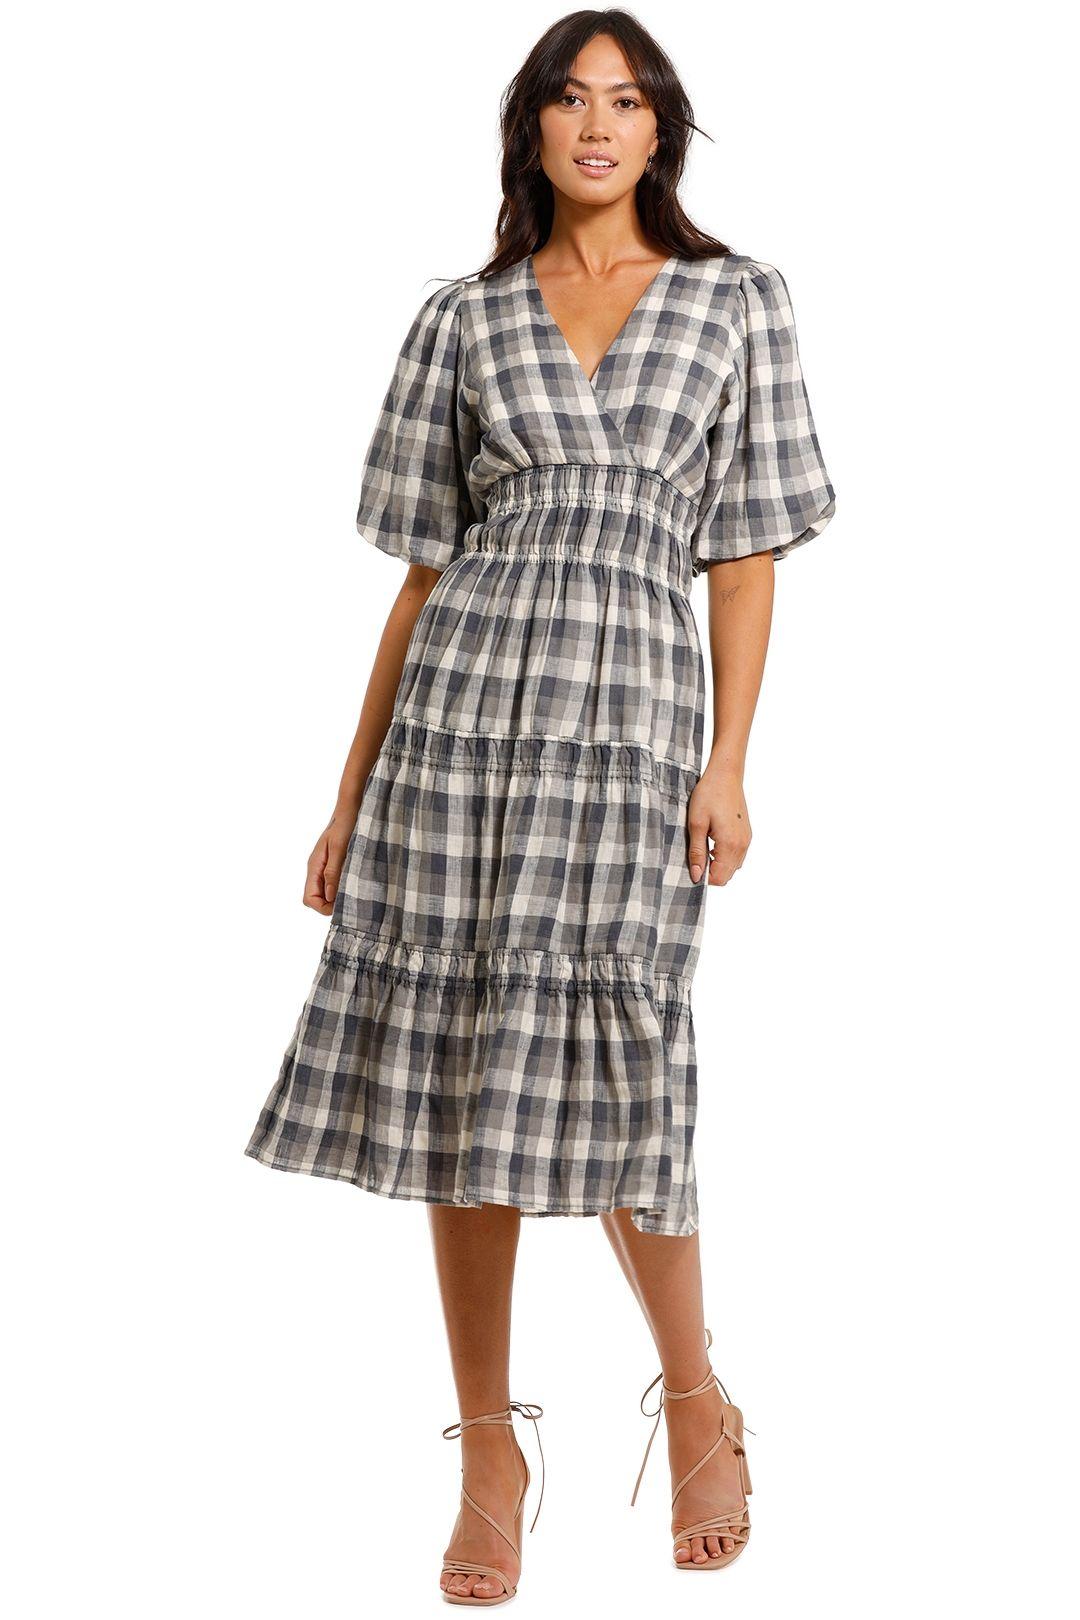 Magali Pascal Appoline Long Dress